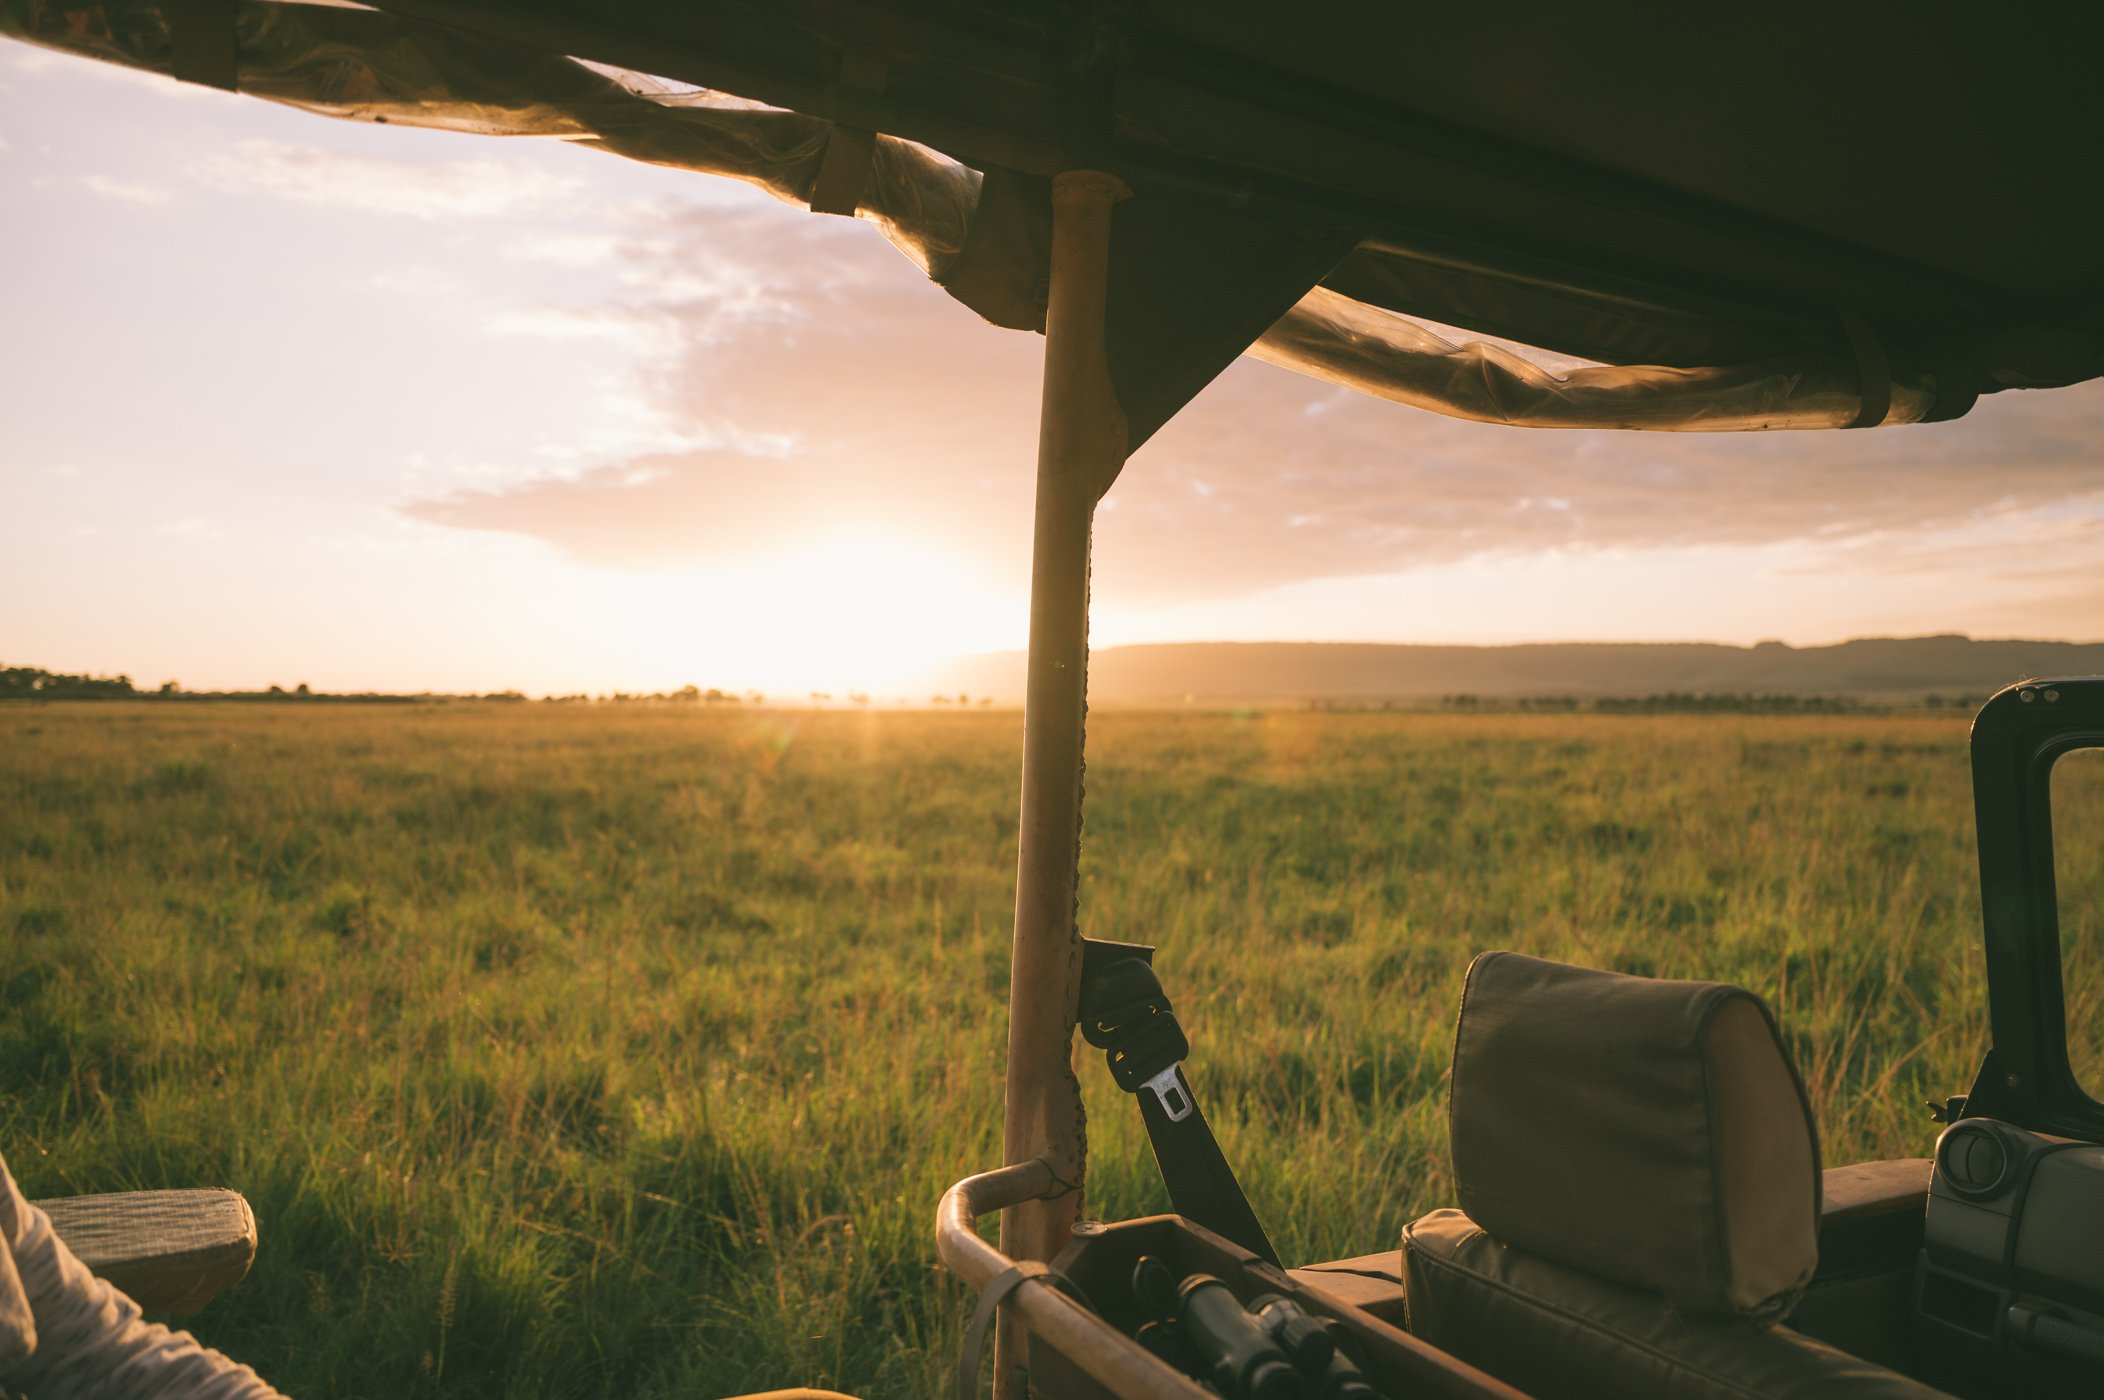 Sunset in the Maasai Mara in Kenya with andBeyond